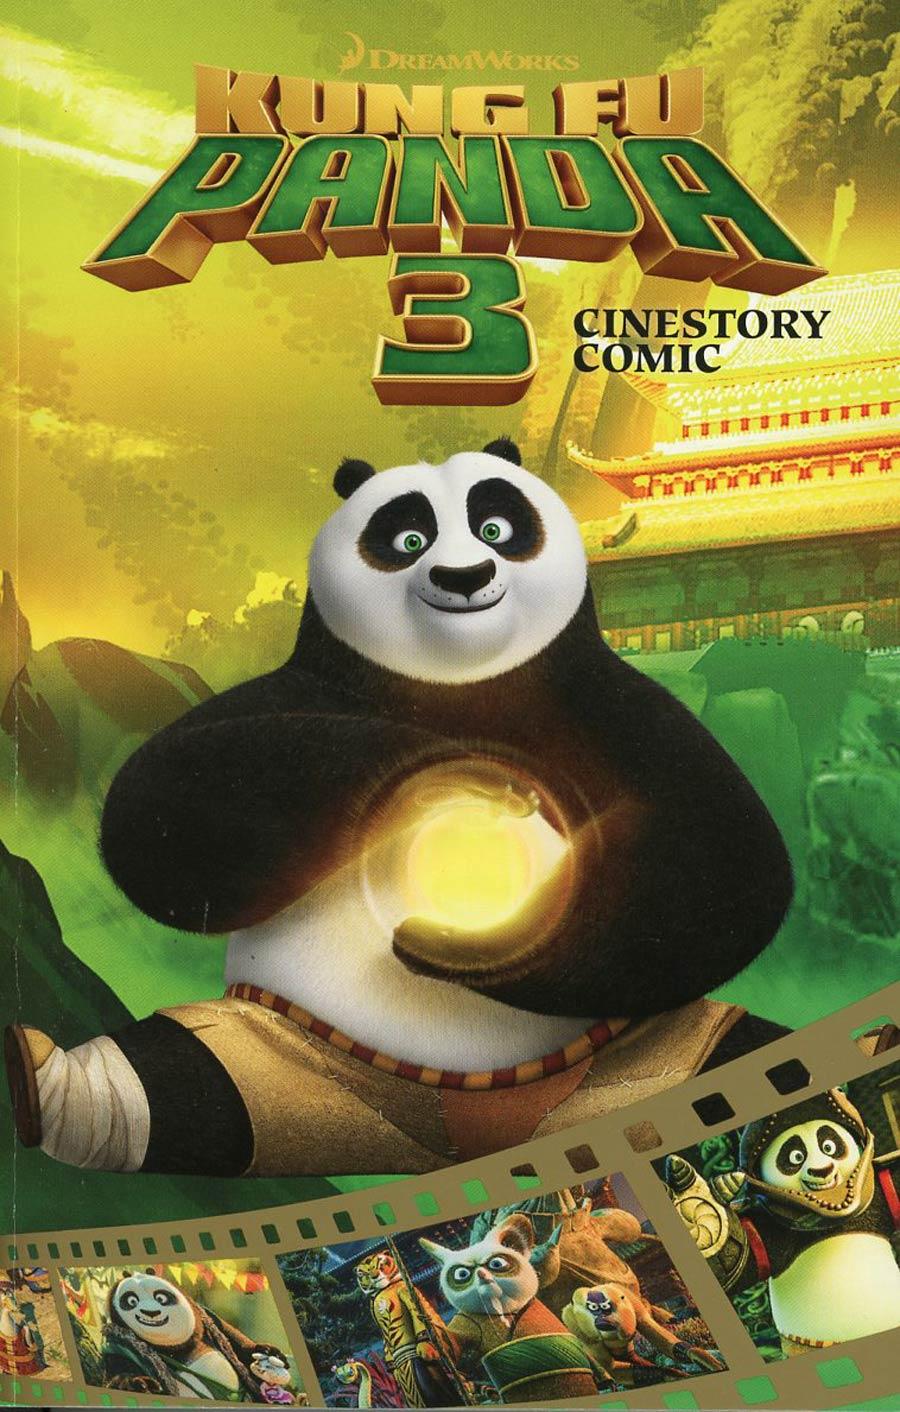 Kung Fu Panda 3 Cinestory Comic TP